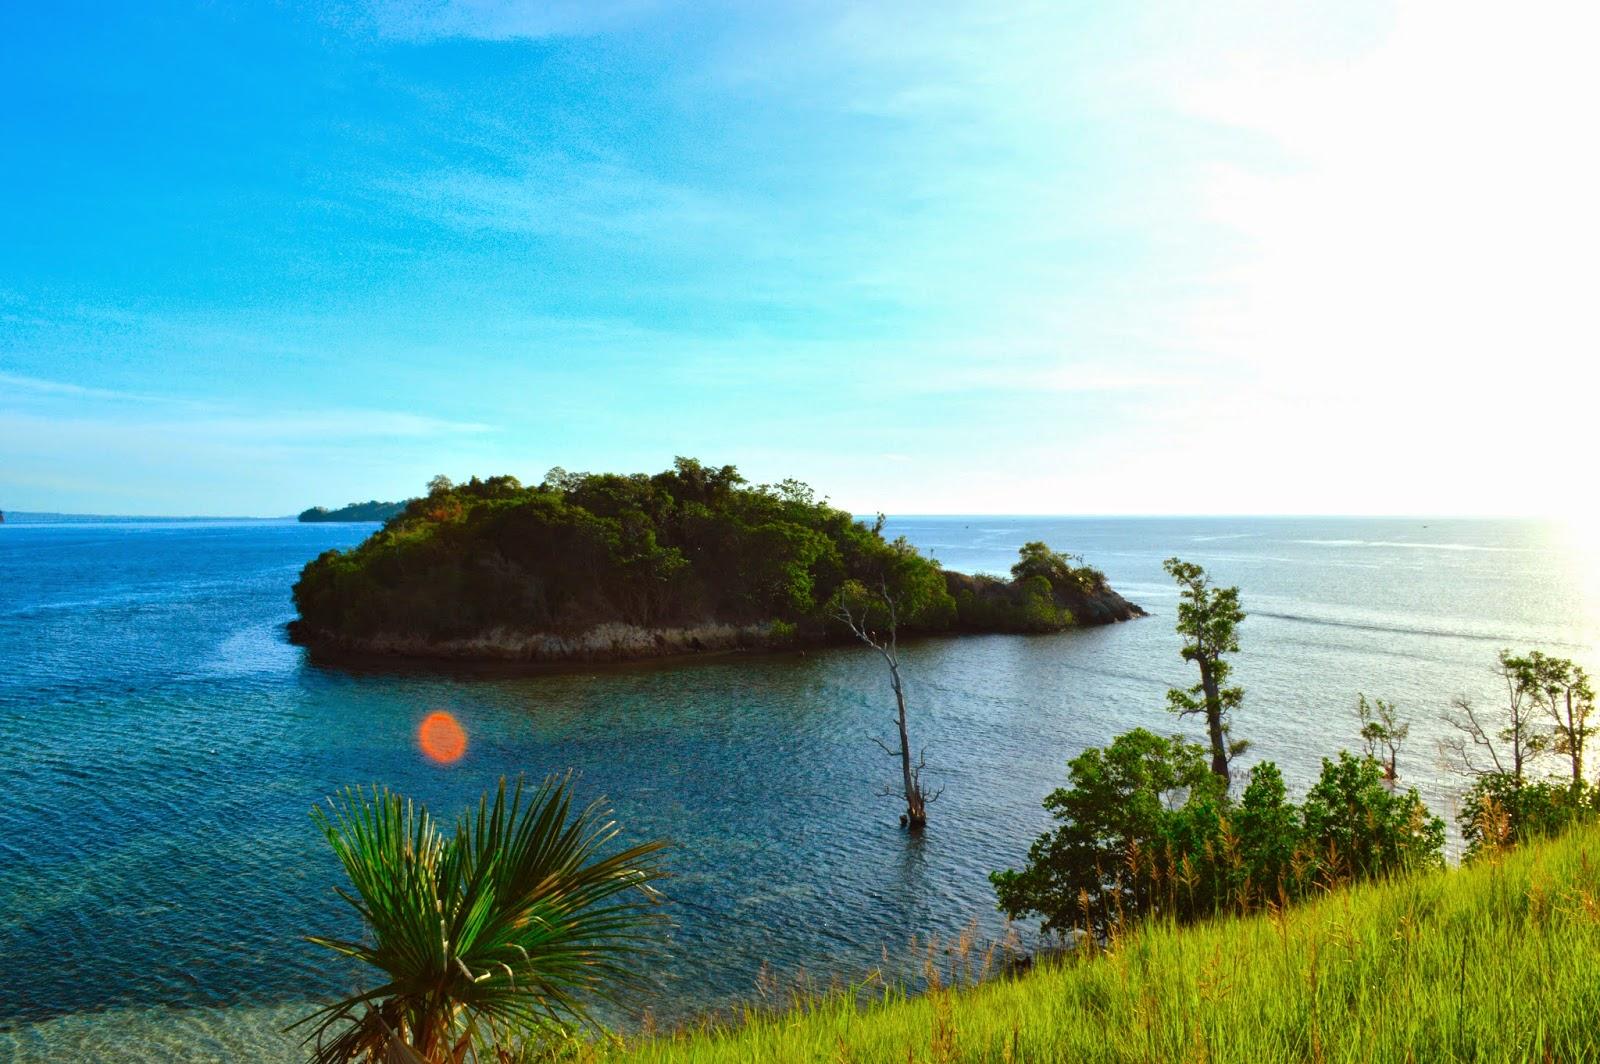 Pulau Dakokayu Seputaran Sulawesi Utara Minahasa Tenggara Pantai Ratatotok Kab